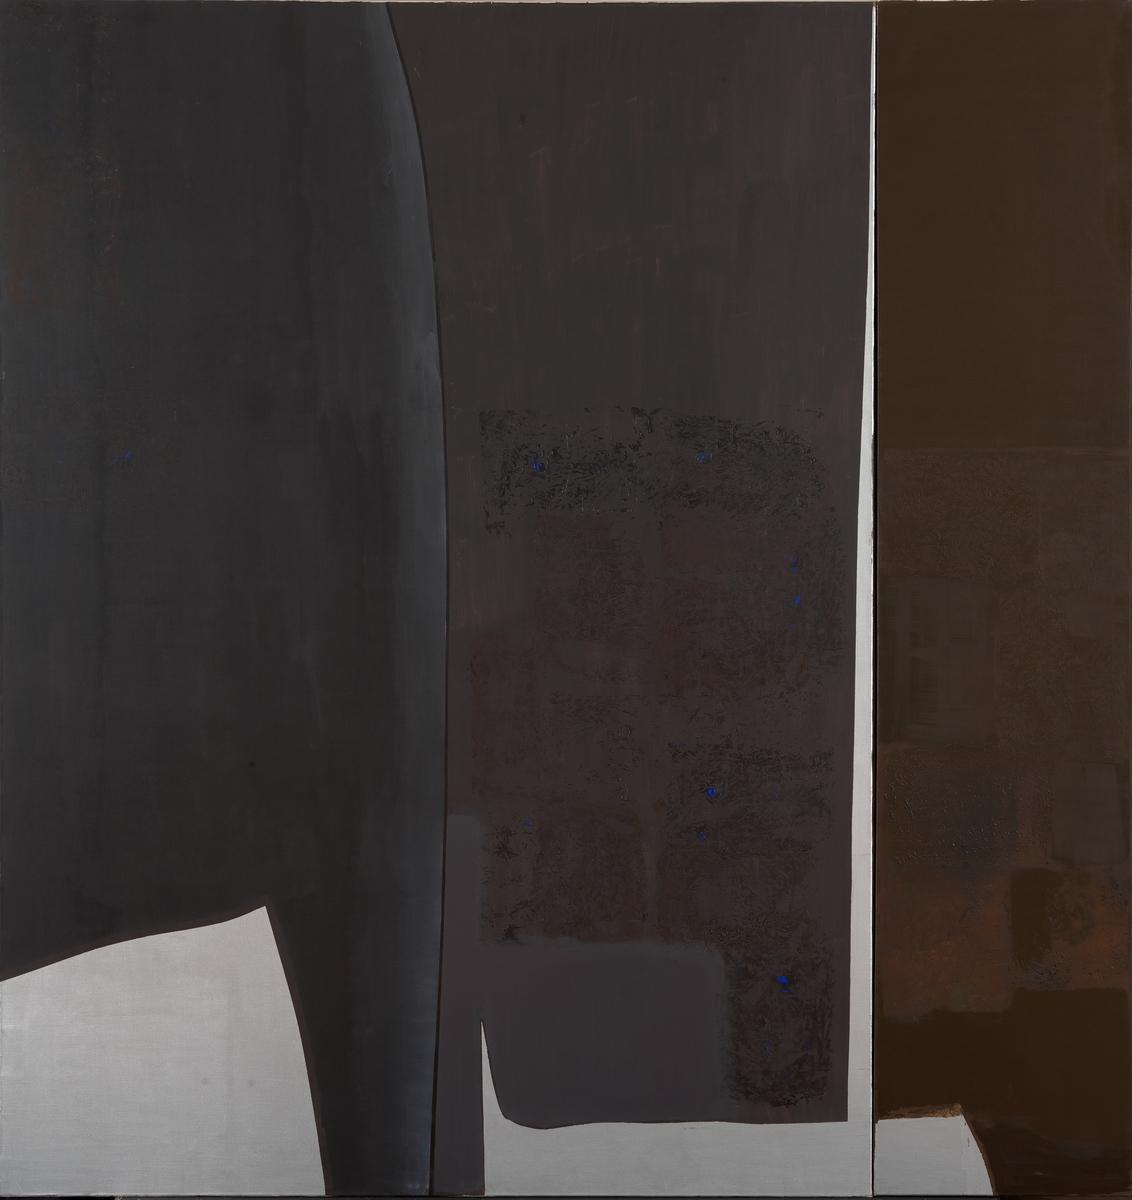 Thalatta [Maleri]